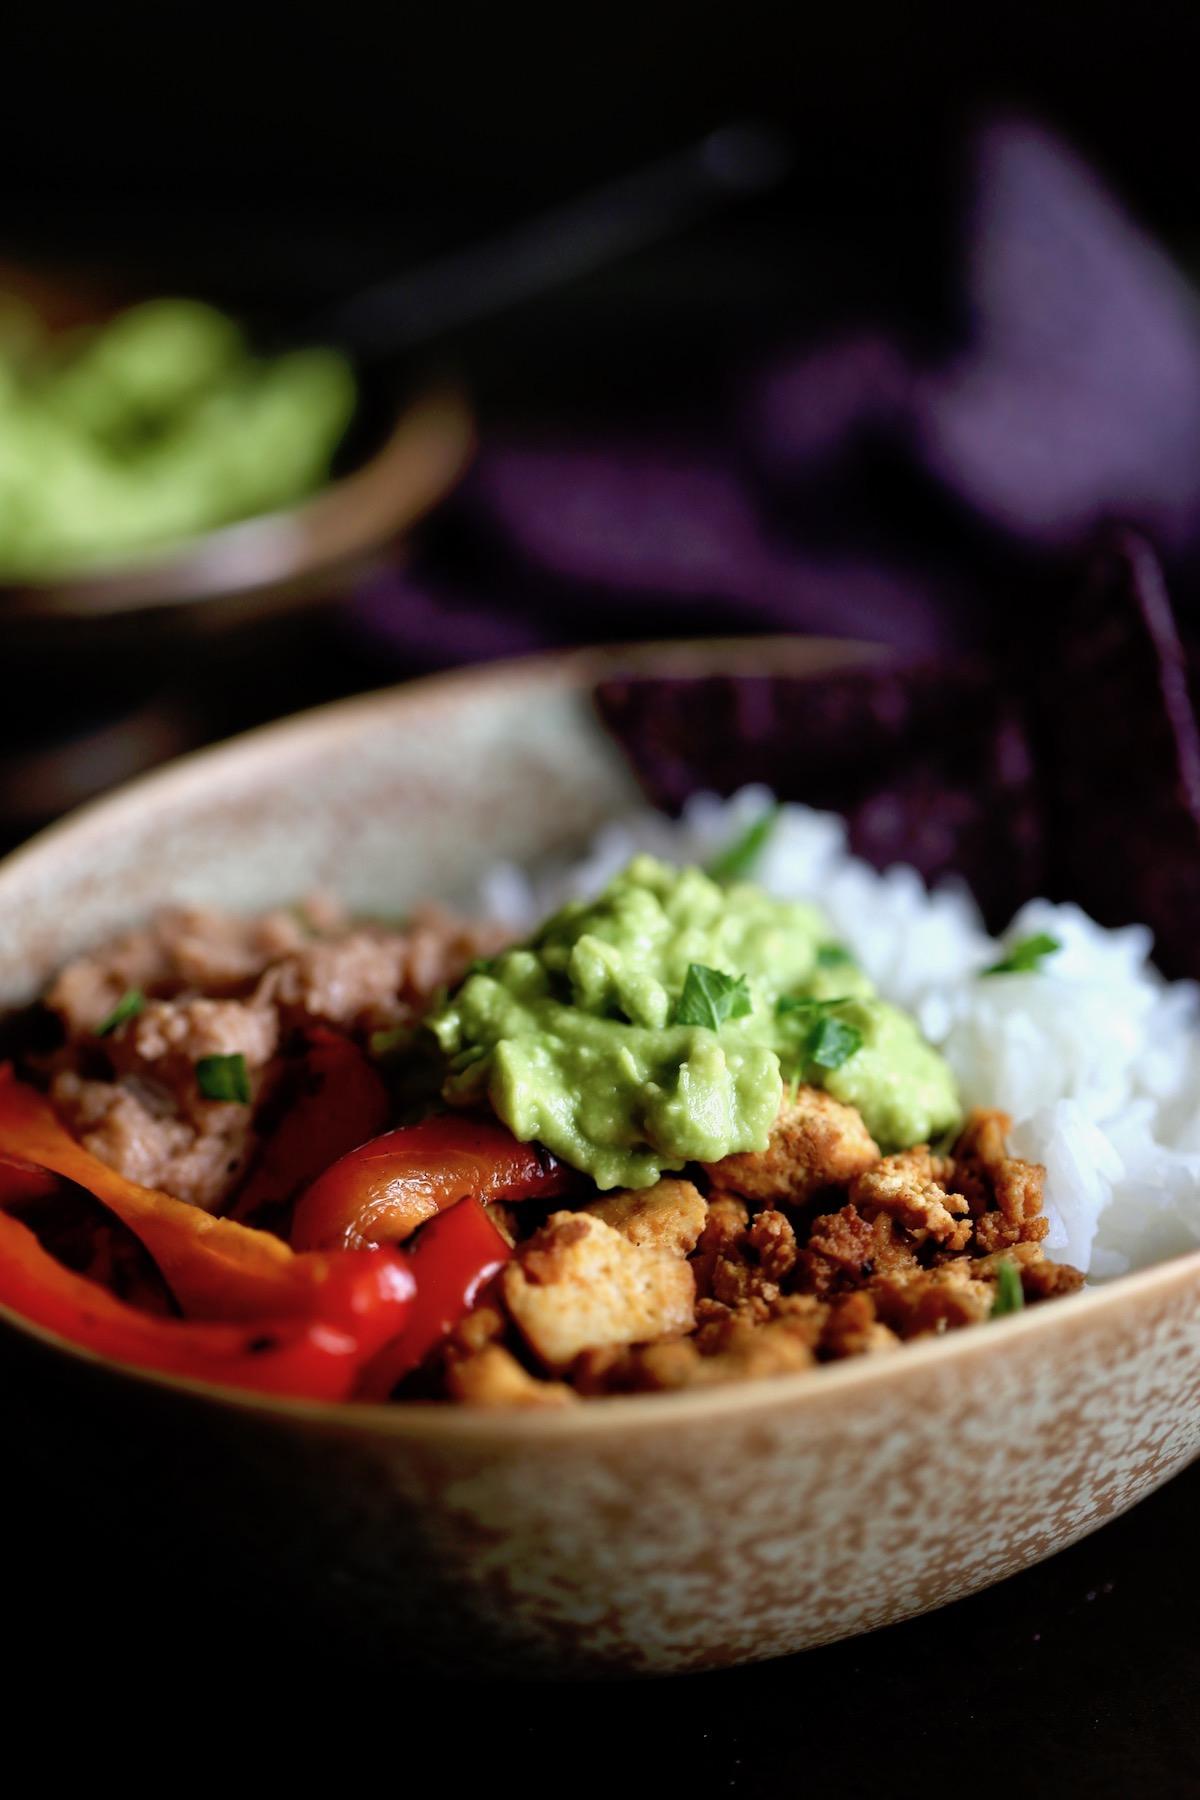 a vegan burrito bowl topped with homemade guacamole